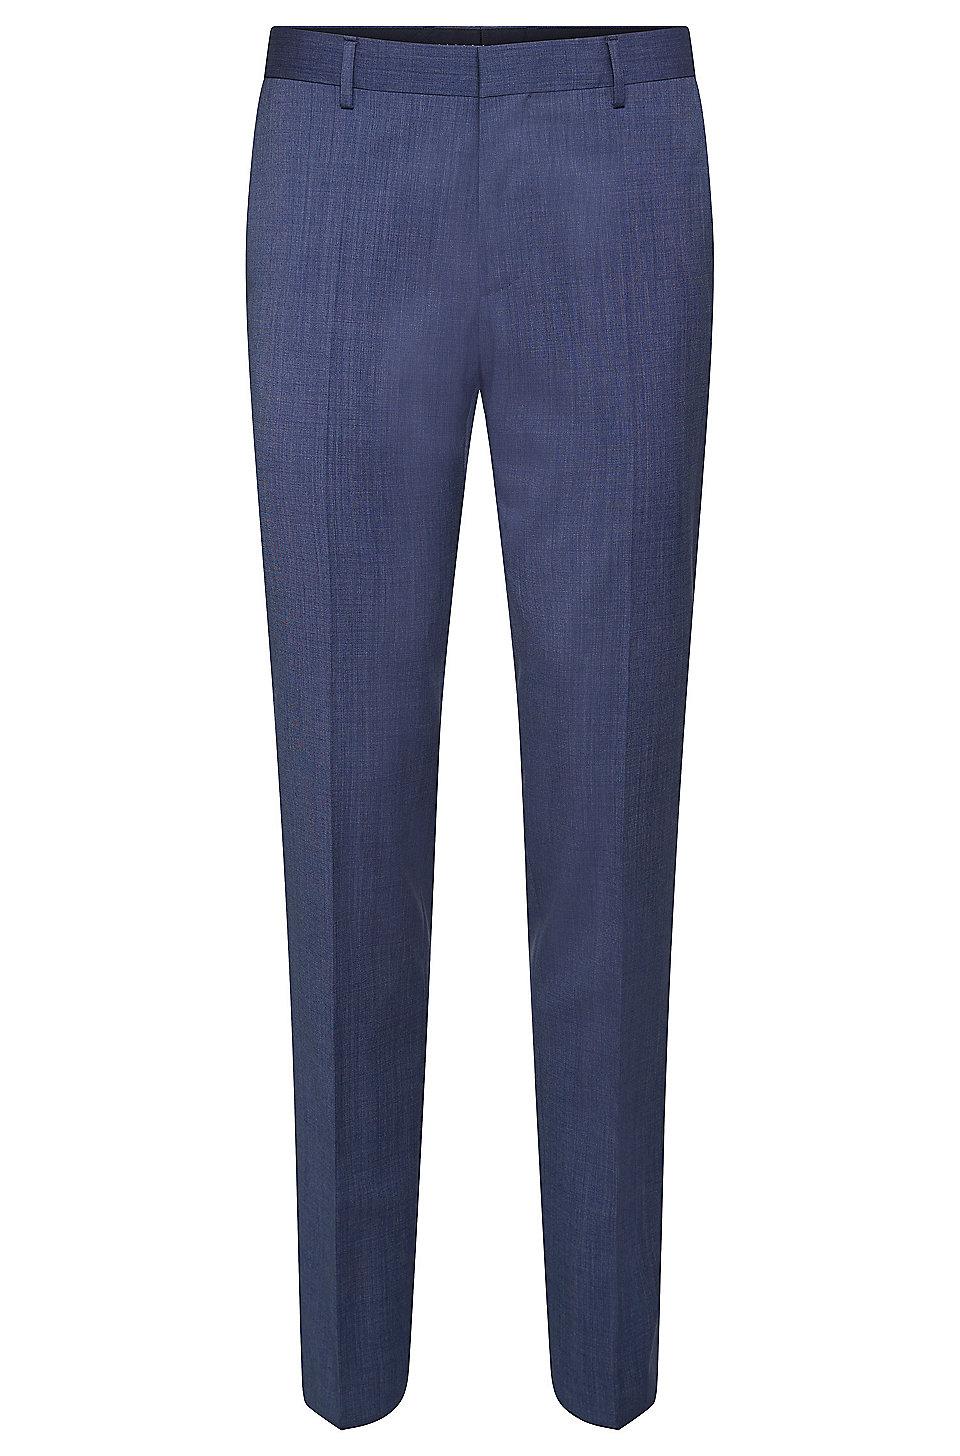 HUGO BOSS® Men's Dress Pants on Sale | Free Shipping